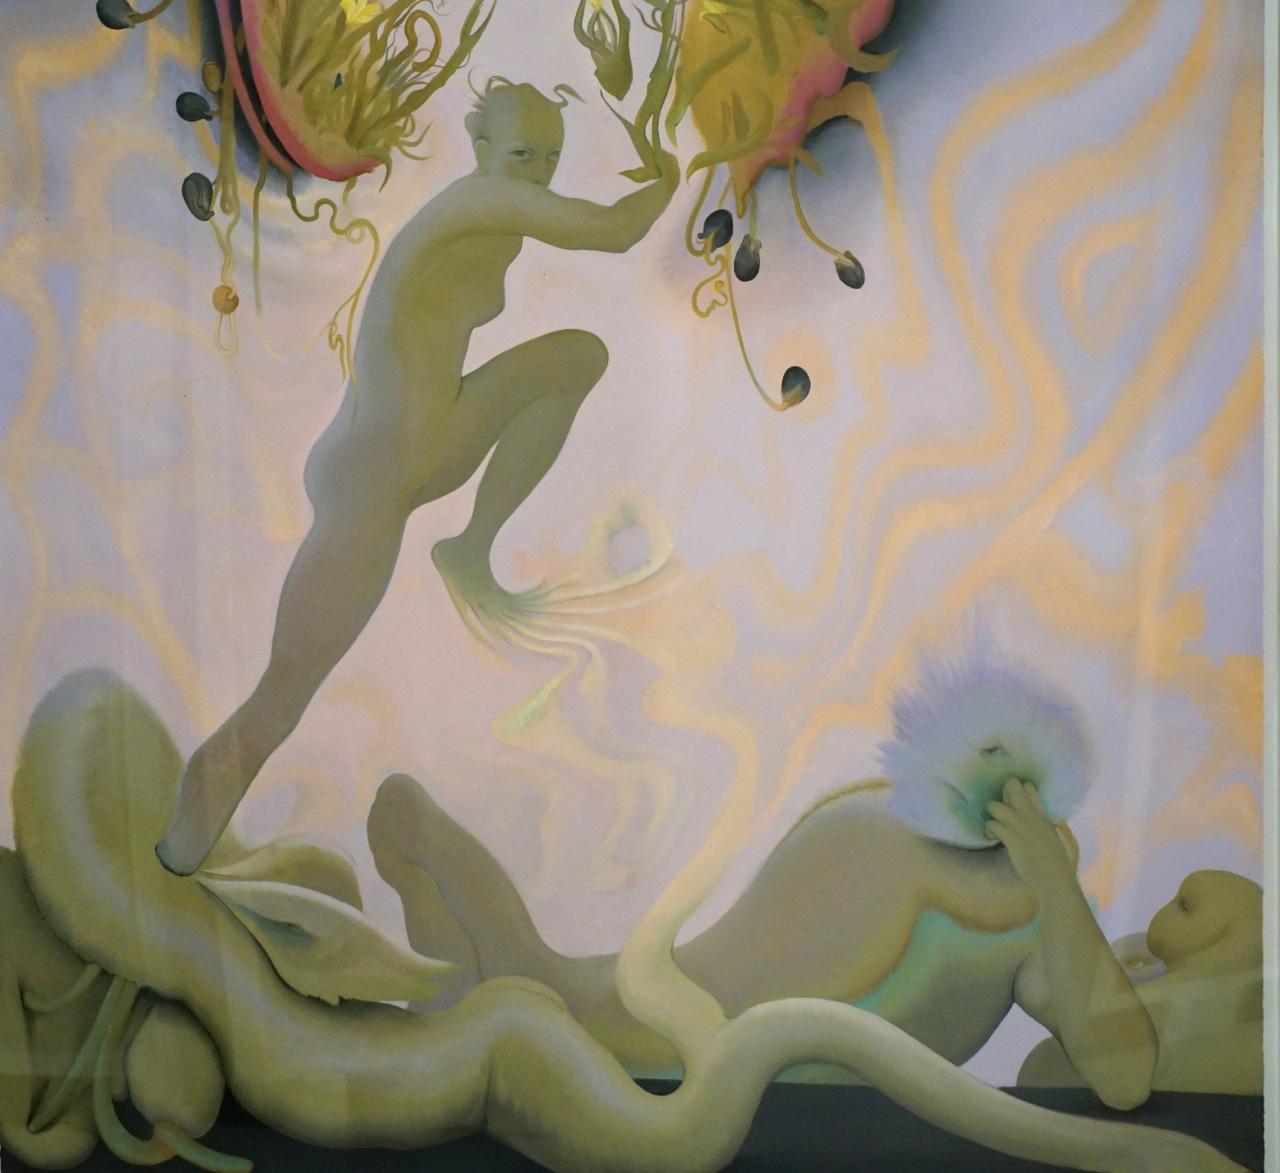 Inka Essenhigh Jacob Lewis Gallery AM 4